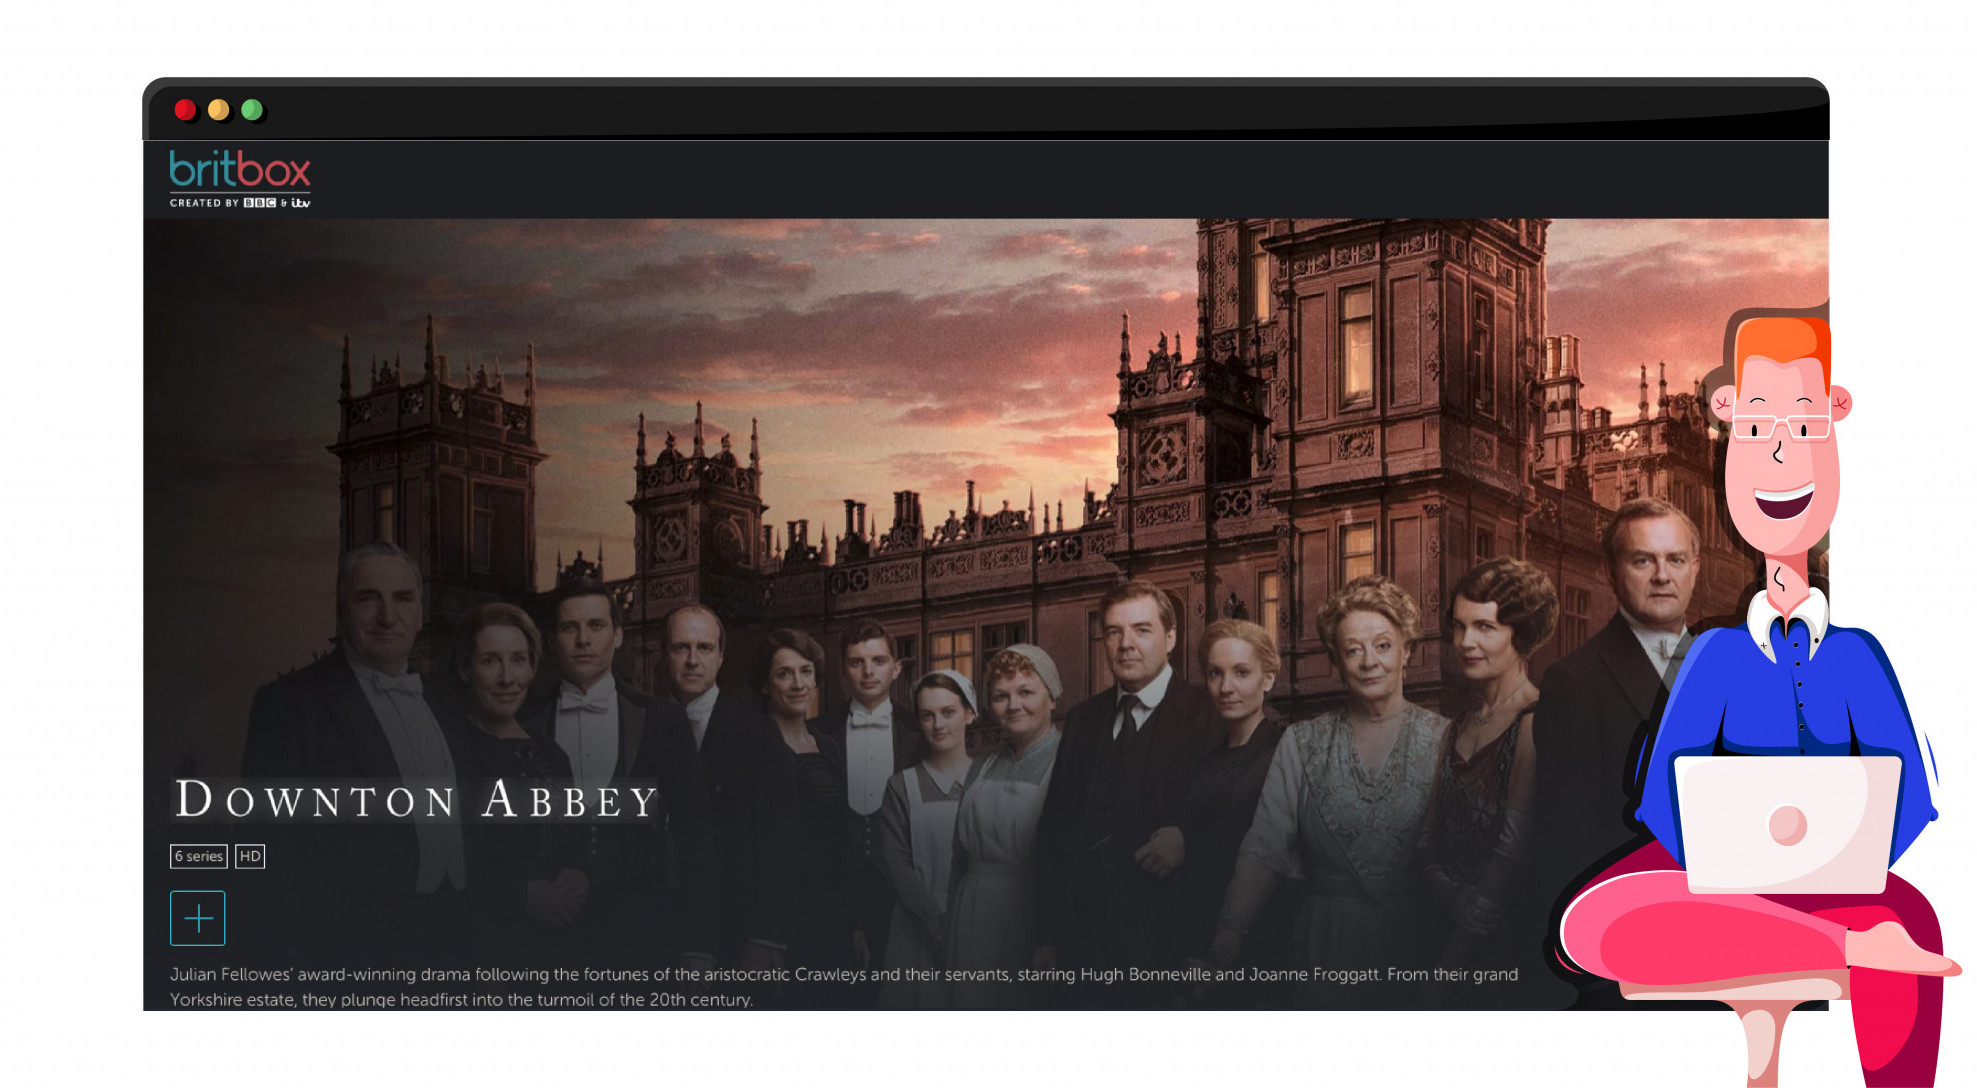 Downton Abbey streaming on ITV HUB